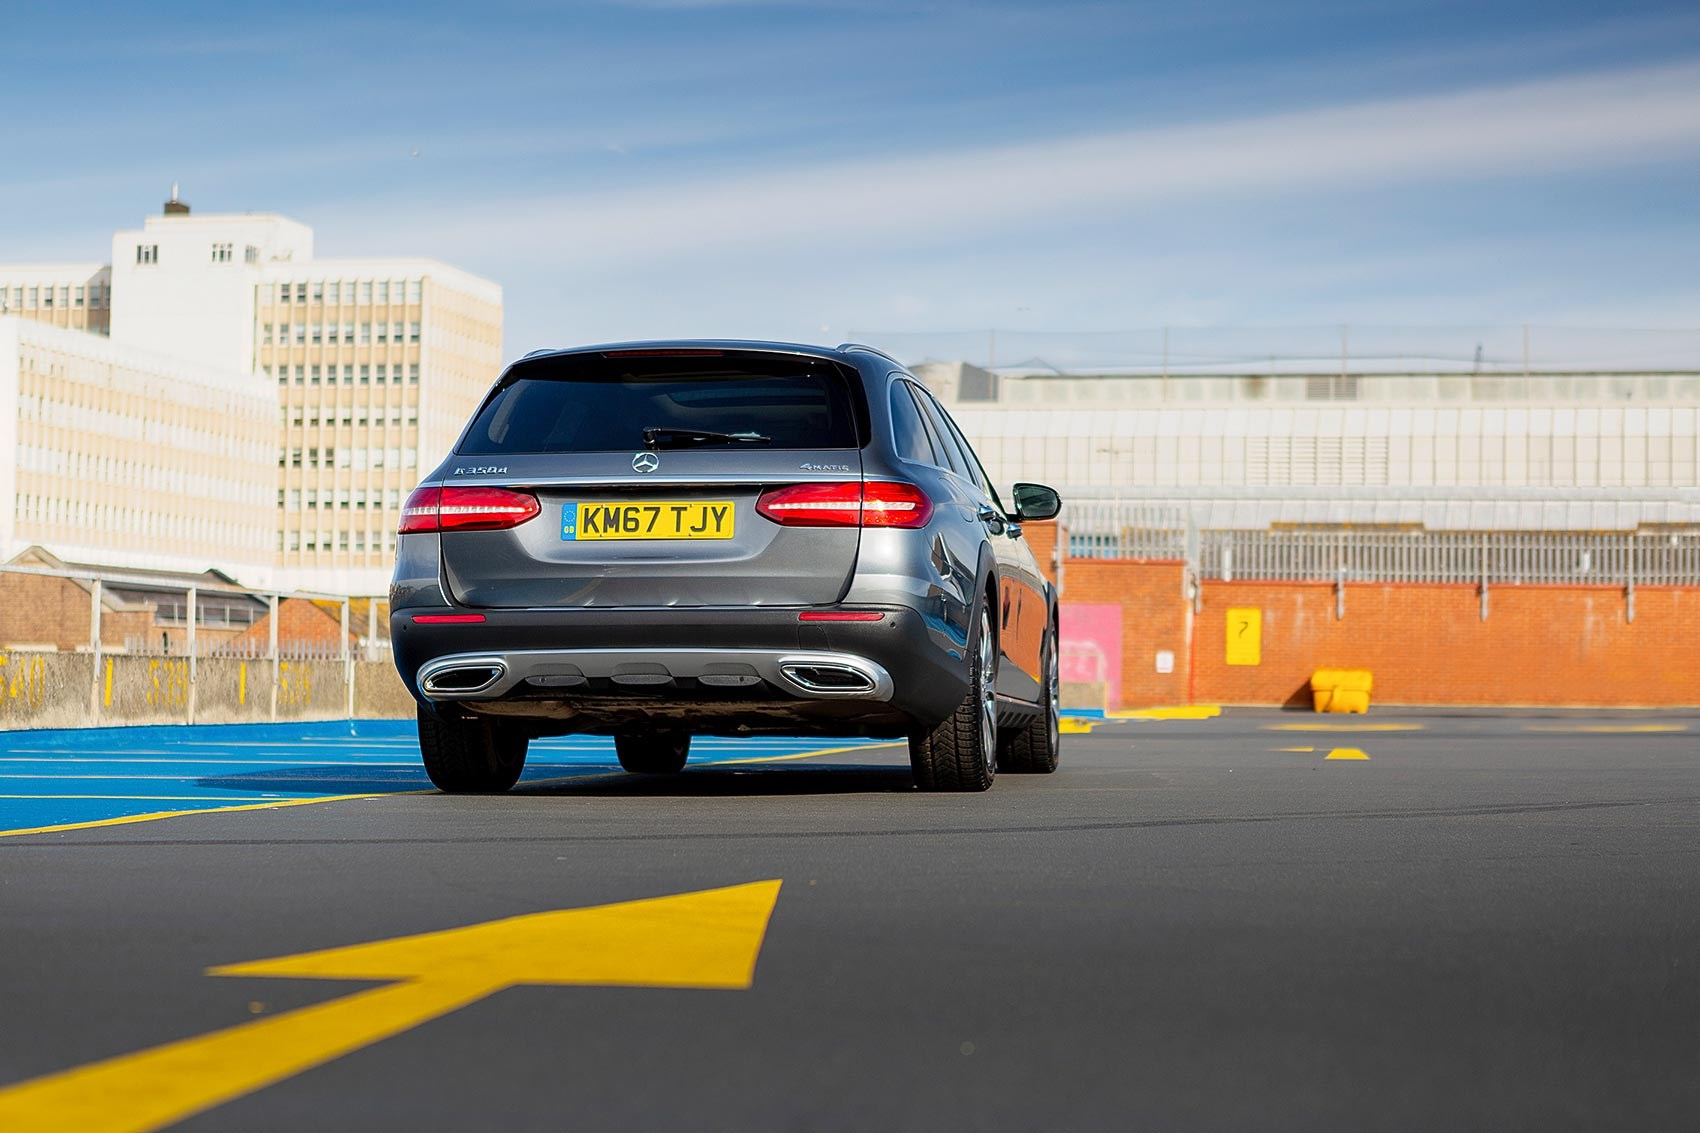 Mercedes E350d 4Matic All-Terrain (2019) long-term test